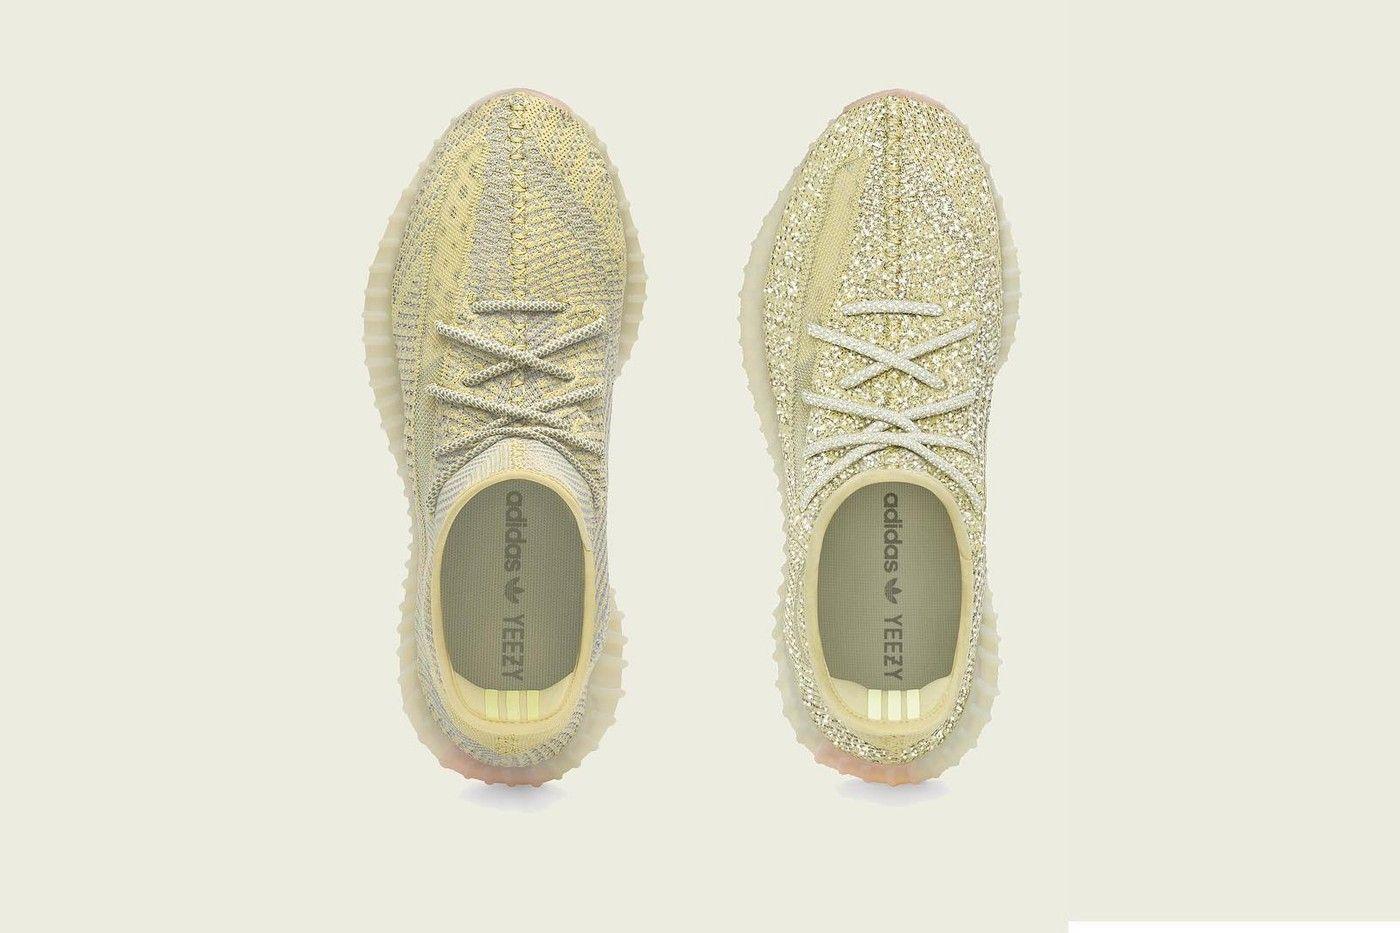 841b76f9 YEEZY BOOST 350 V2「Antlia」配色官方圖輯釋出 | Shoes | Yeezy boost ...